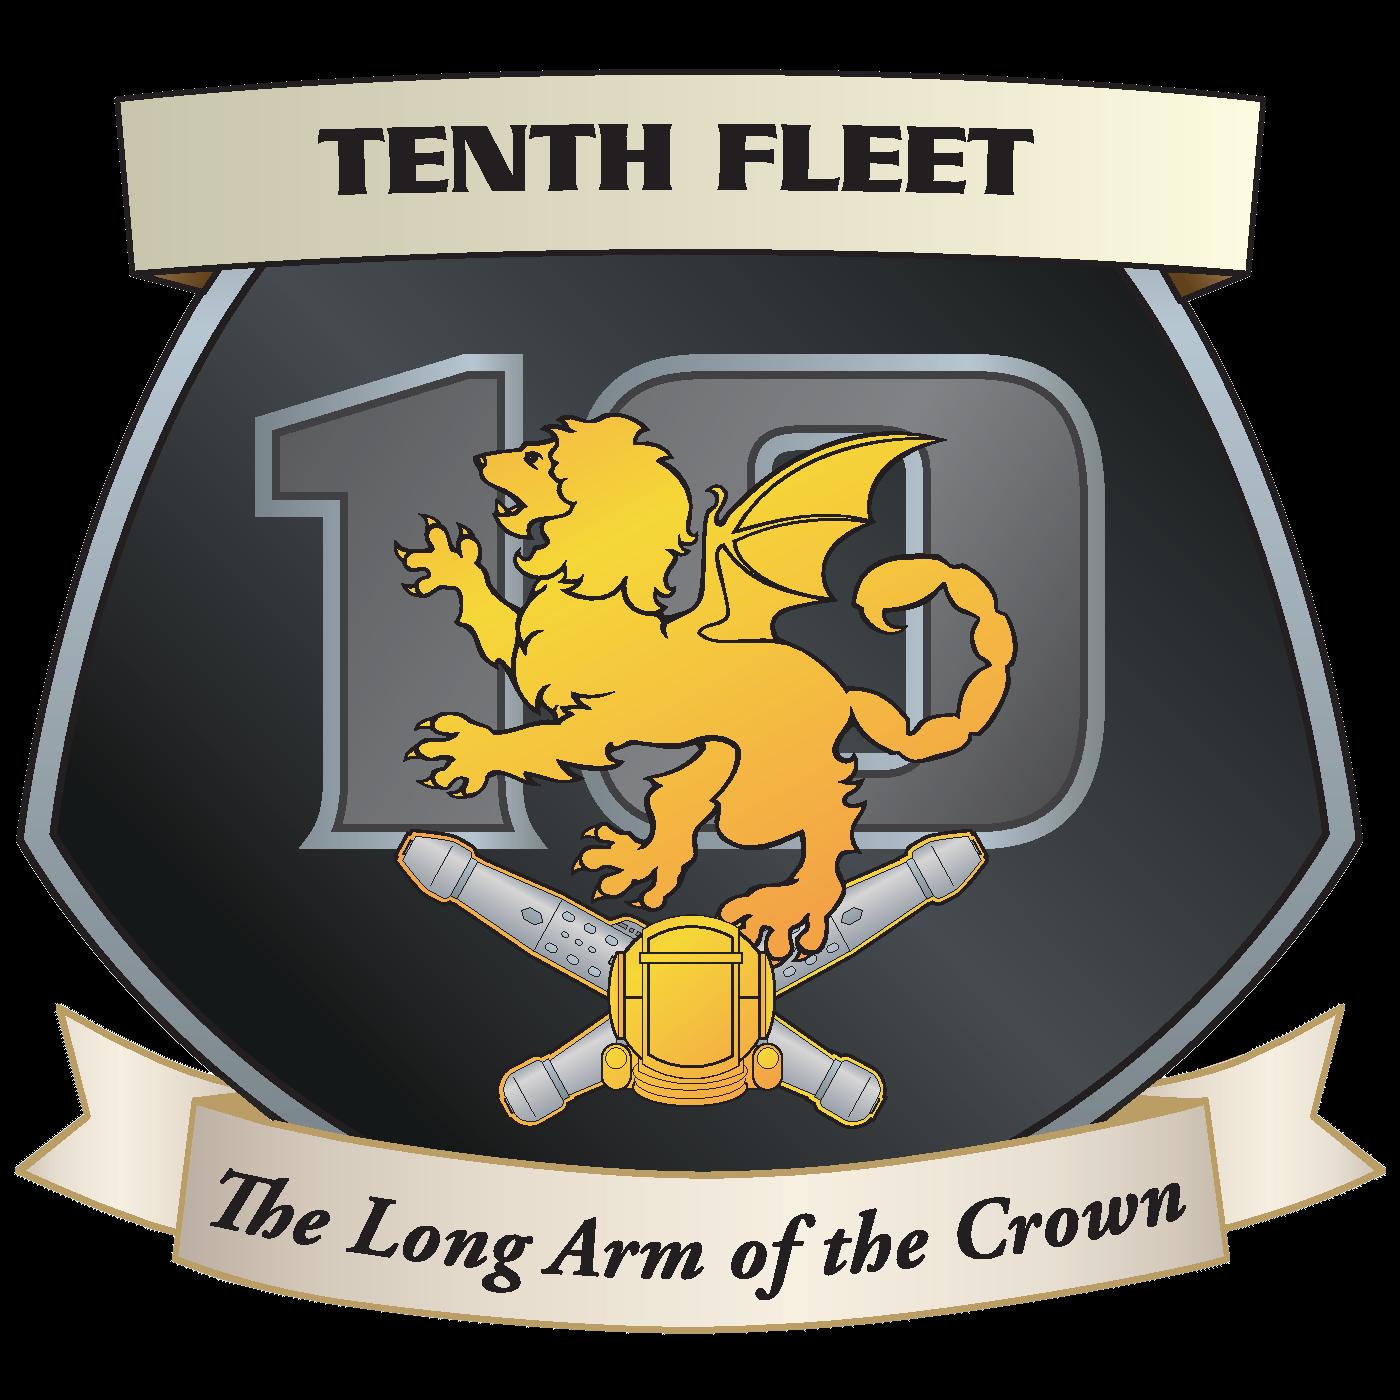 Staff tenth fleet the. Navy clipart chief petty officer